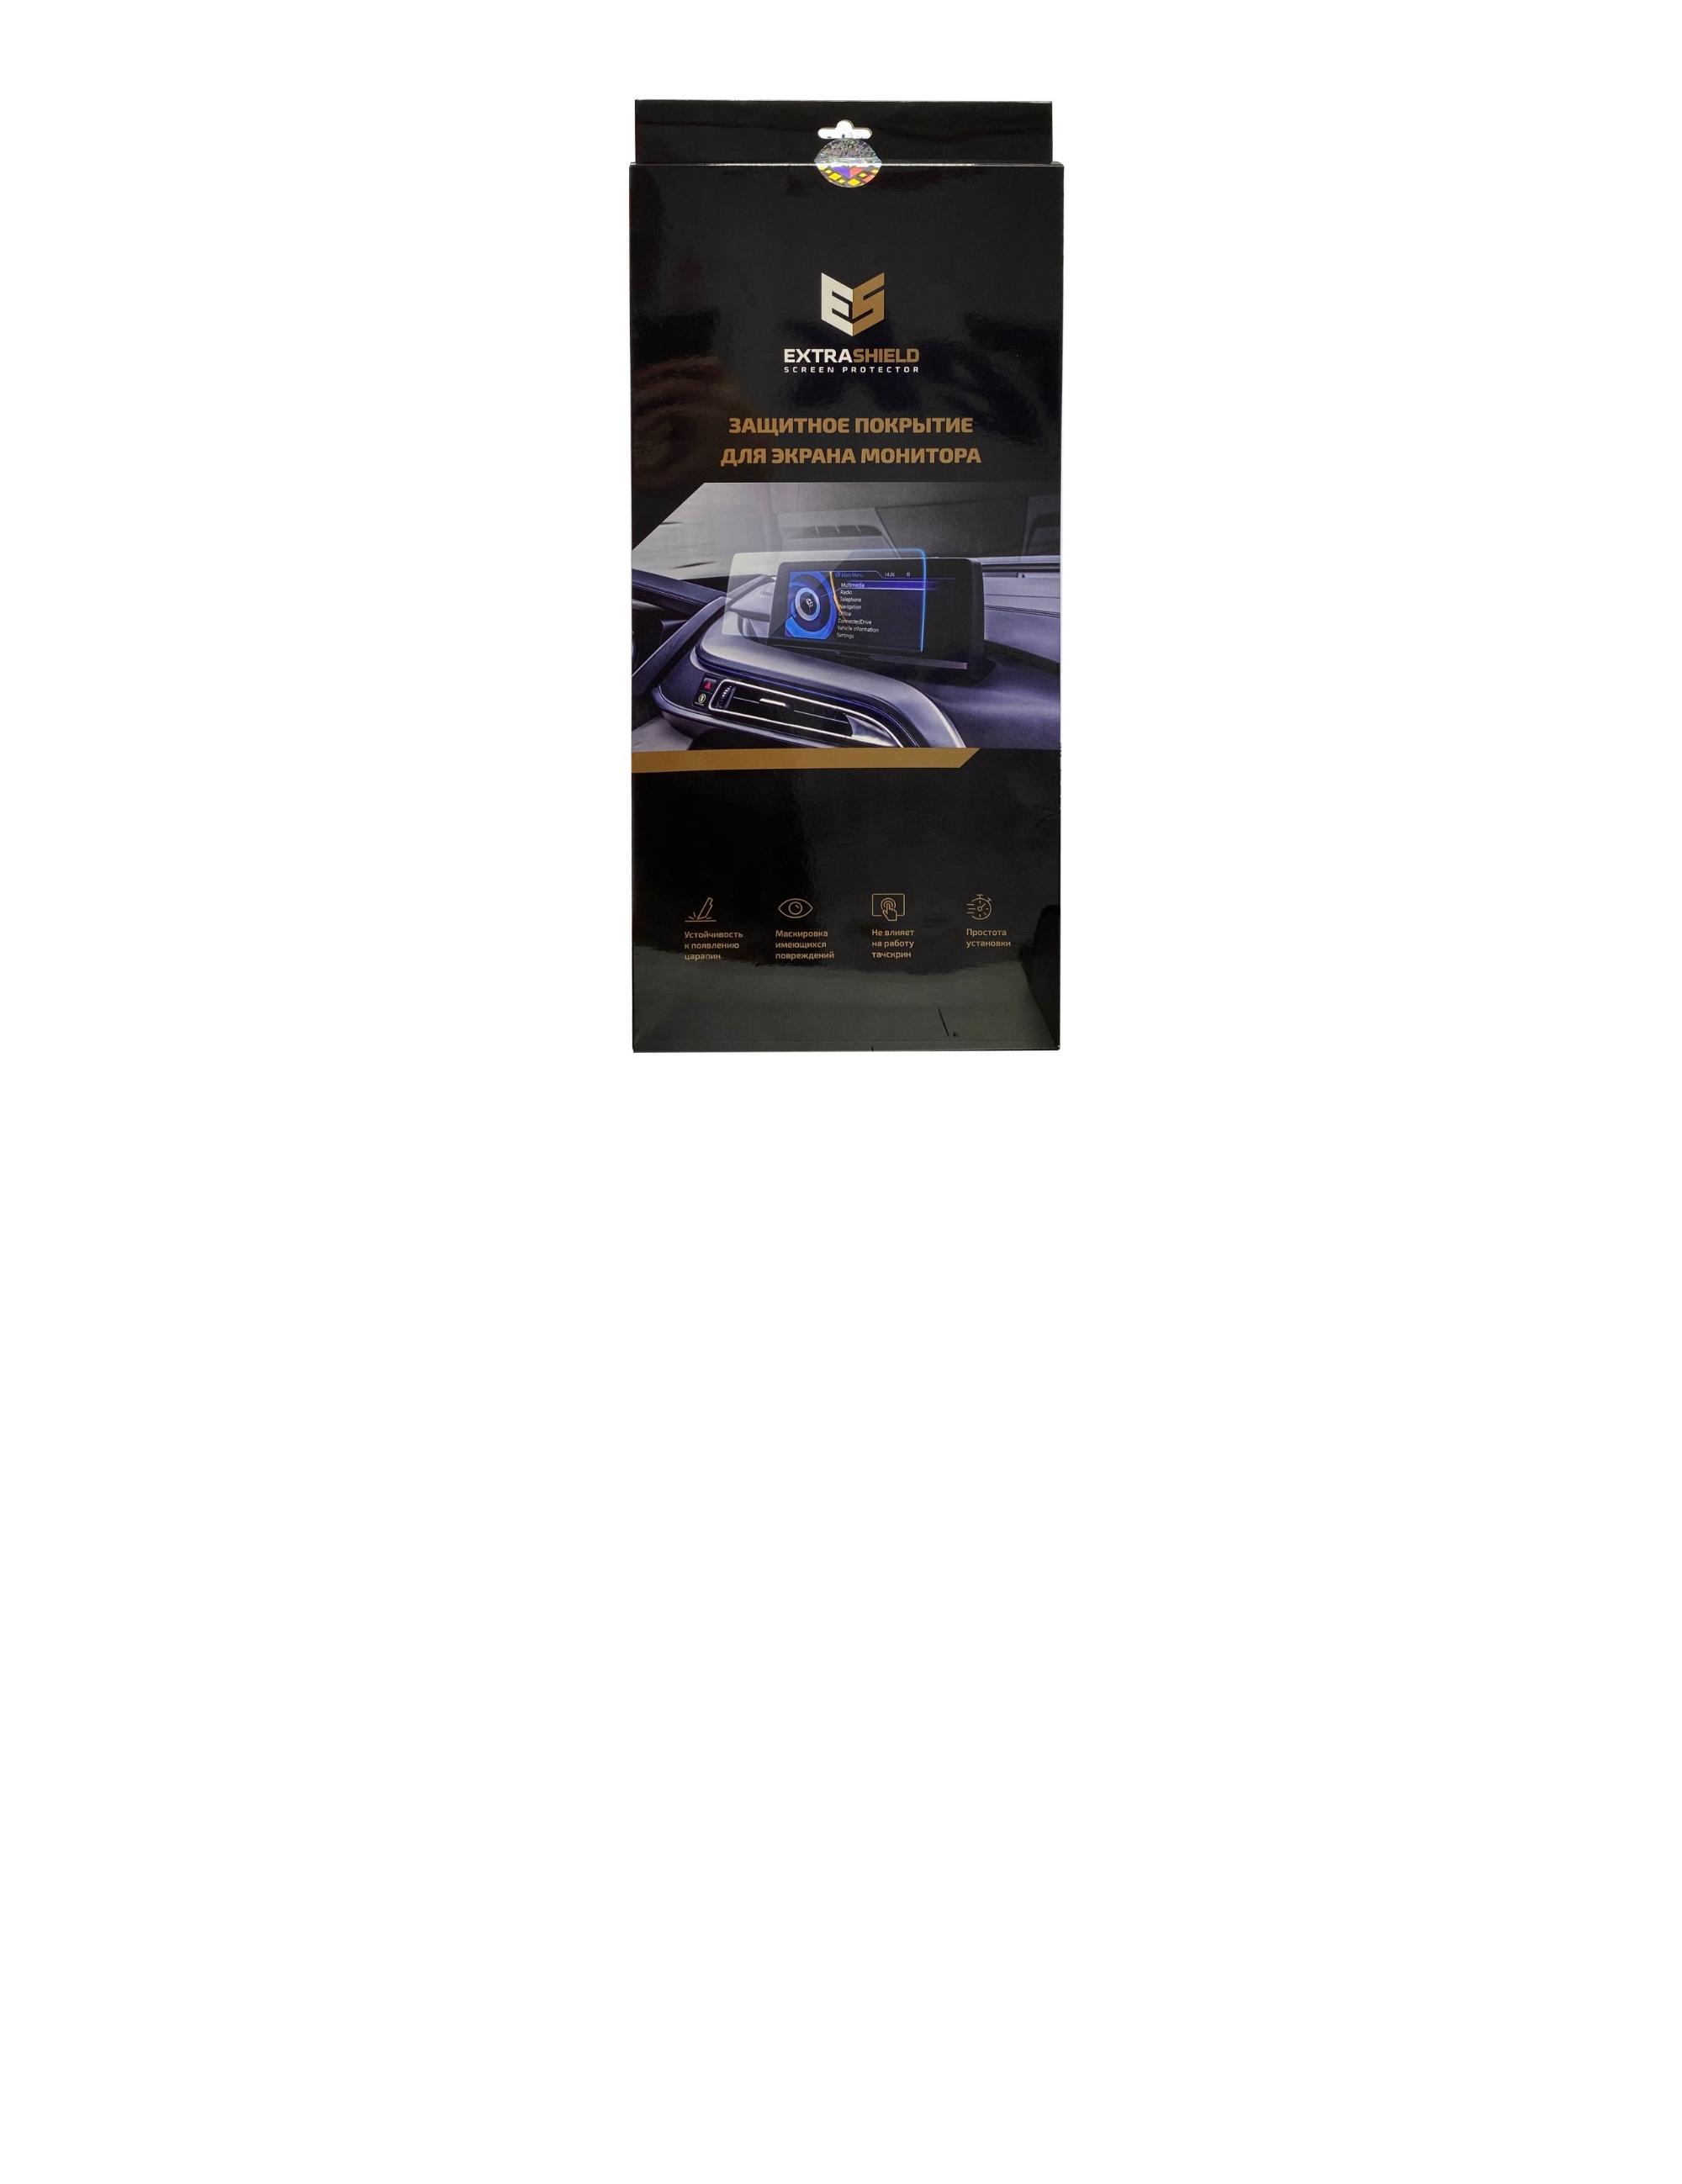 BMW X3 (F25) 2014 - 2017 мультимедиа NBT 8.8 Защитное стекло Глянец